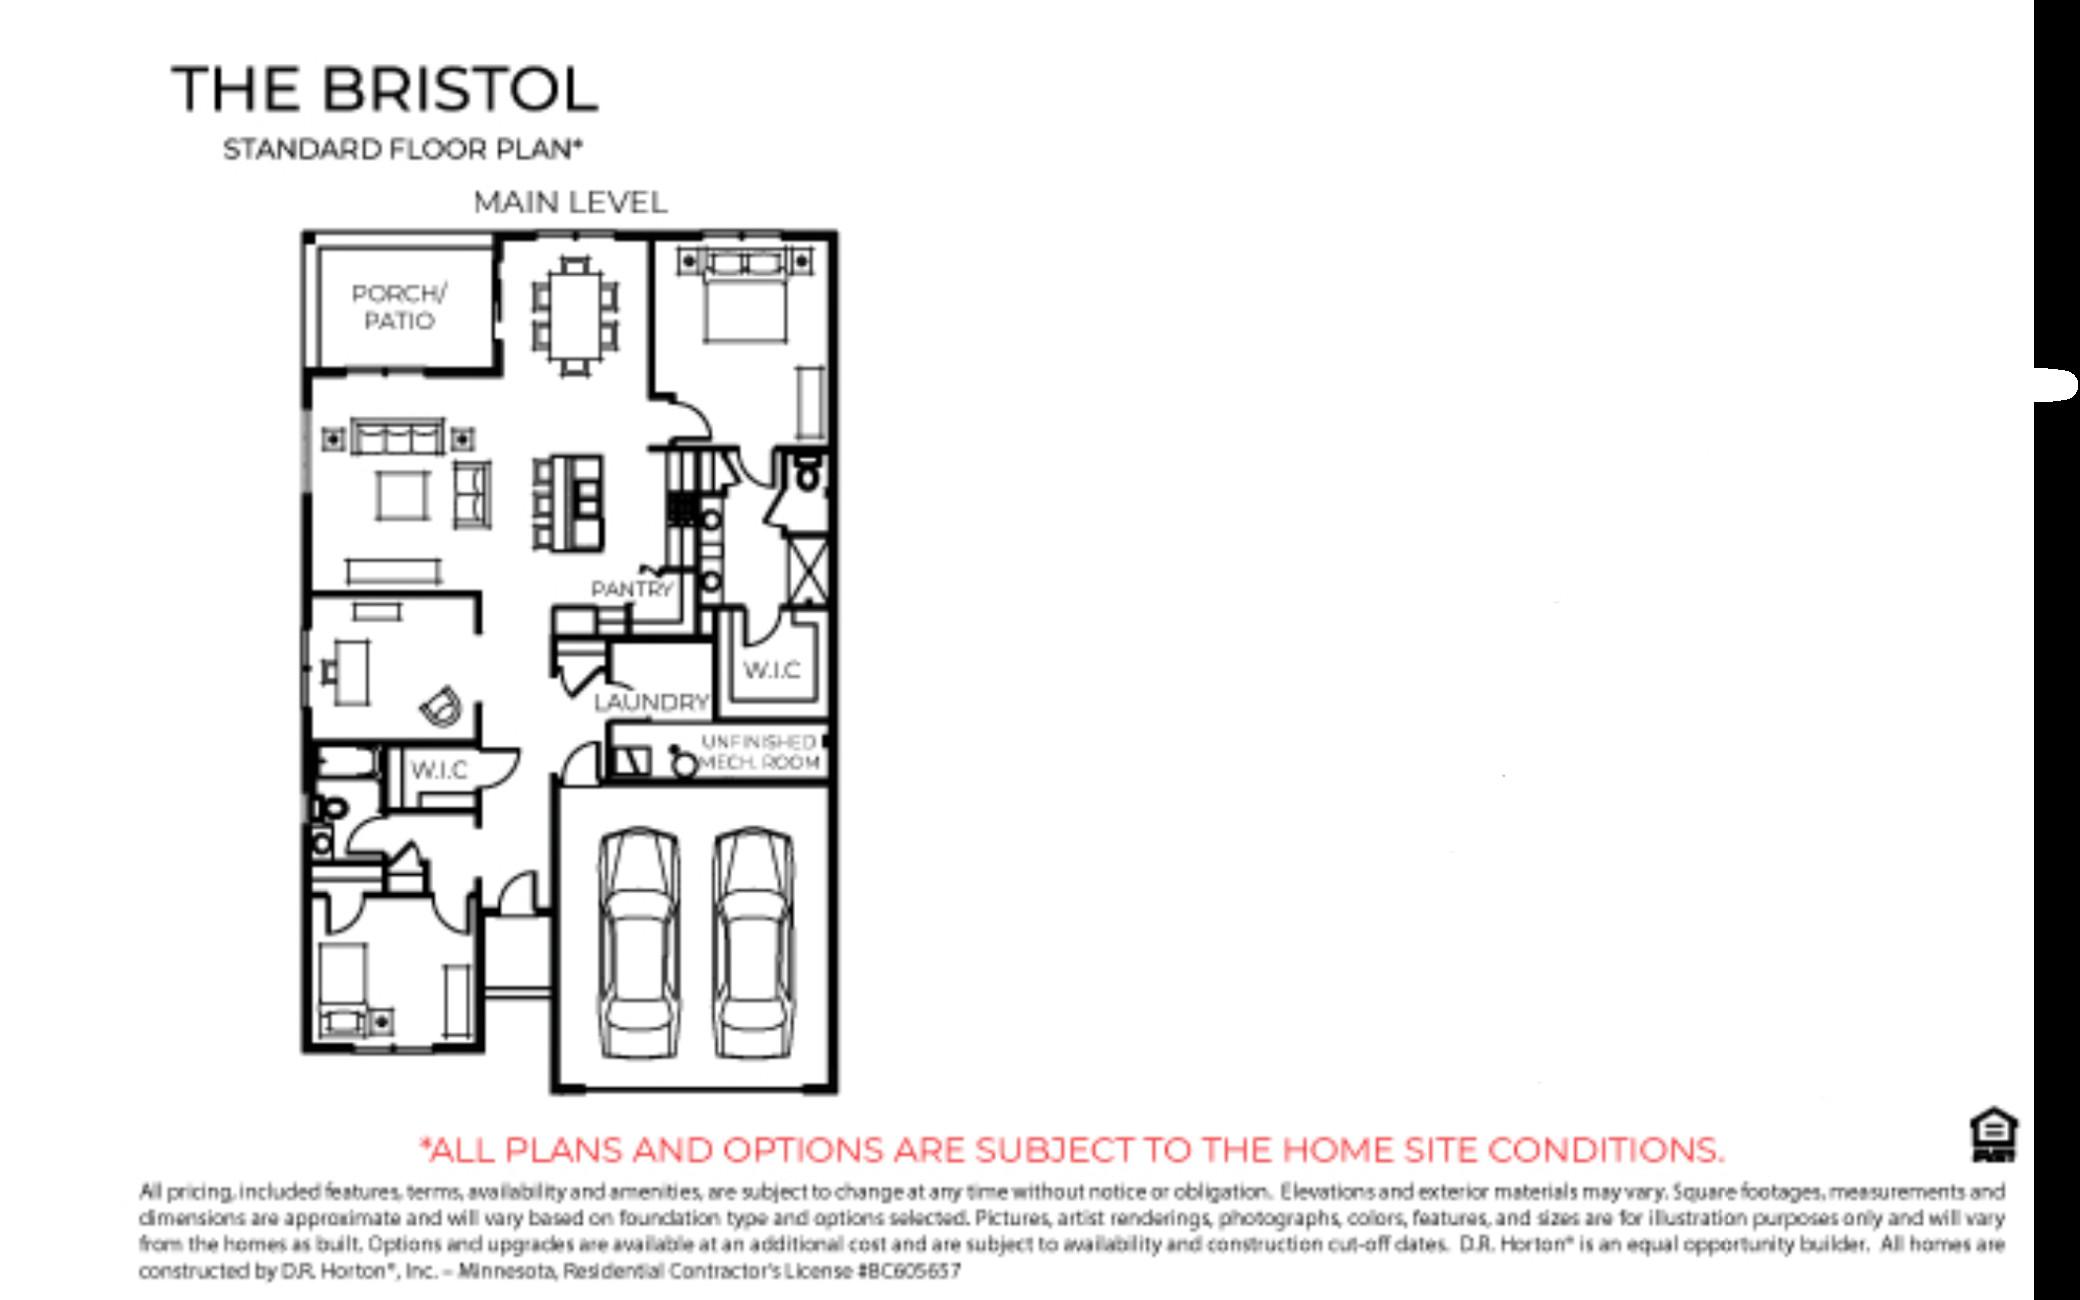 Bristol slab on grade floorplan but includes a 3rd stall garage.